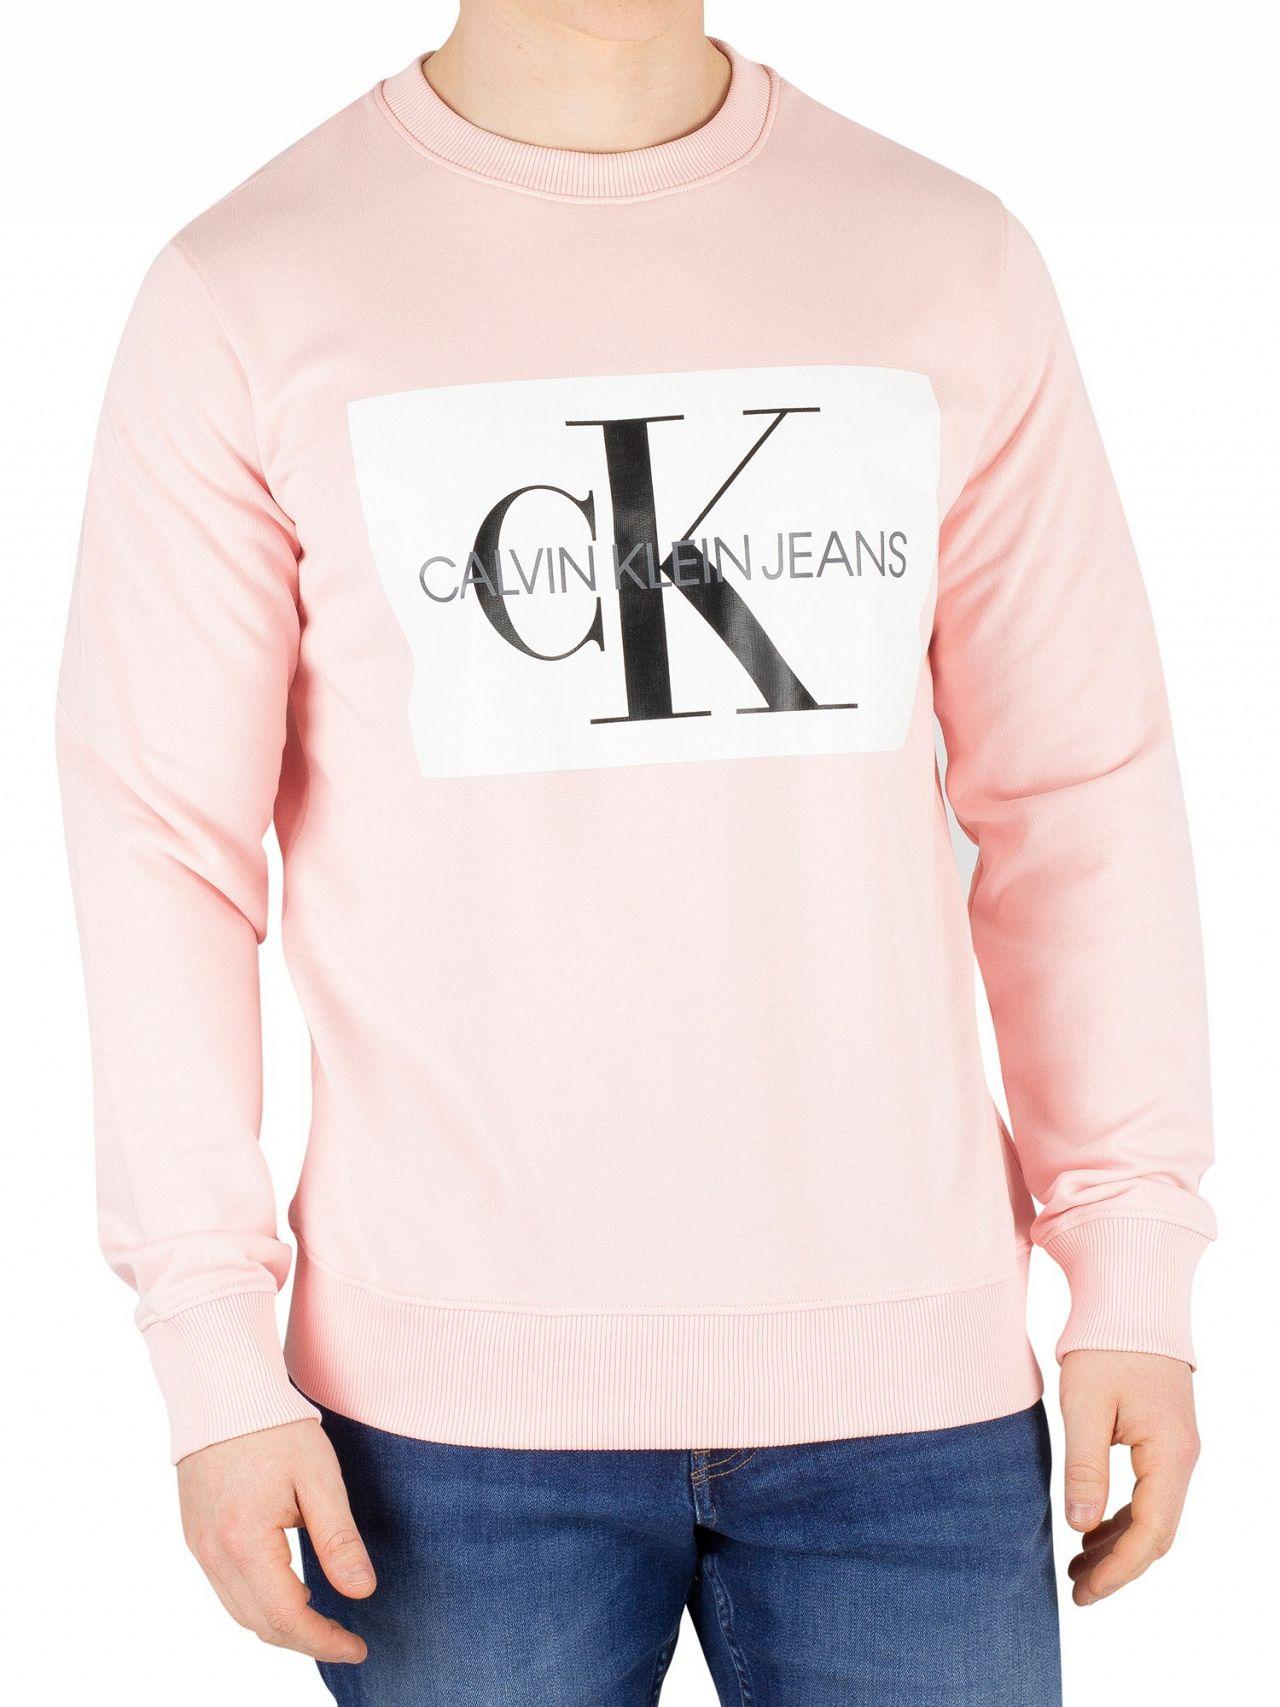 d9c03fc5 Calvin Klein Jeans Strawberry Cream Monogram Box Logo Sweatshirt ...